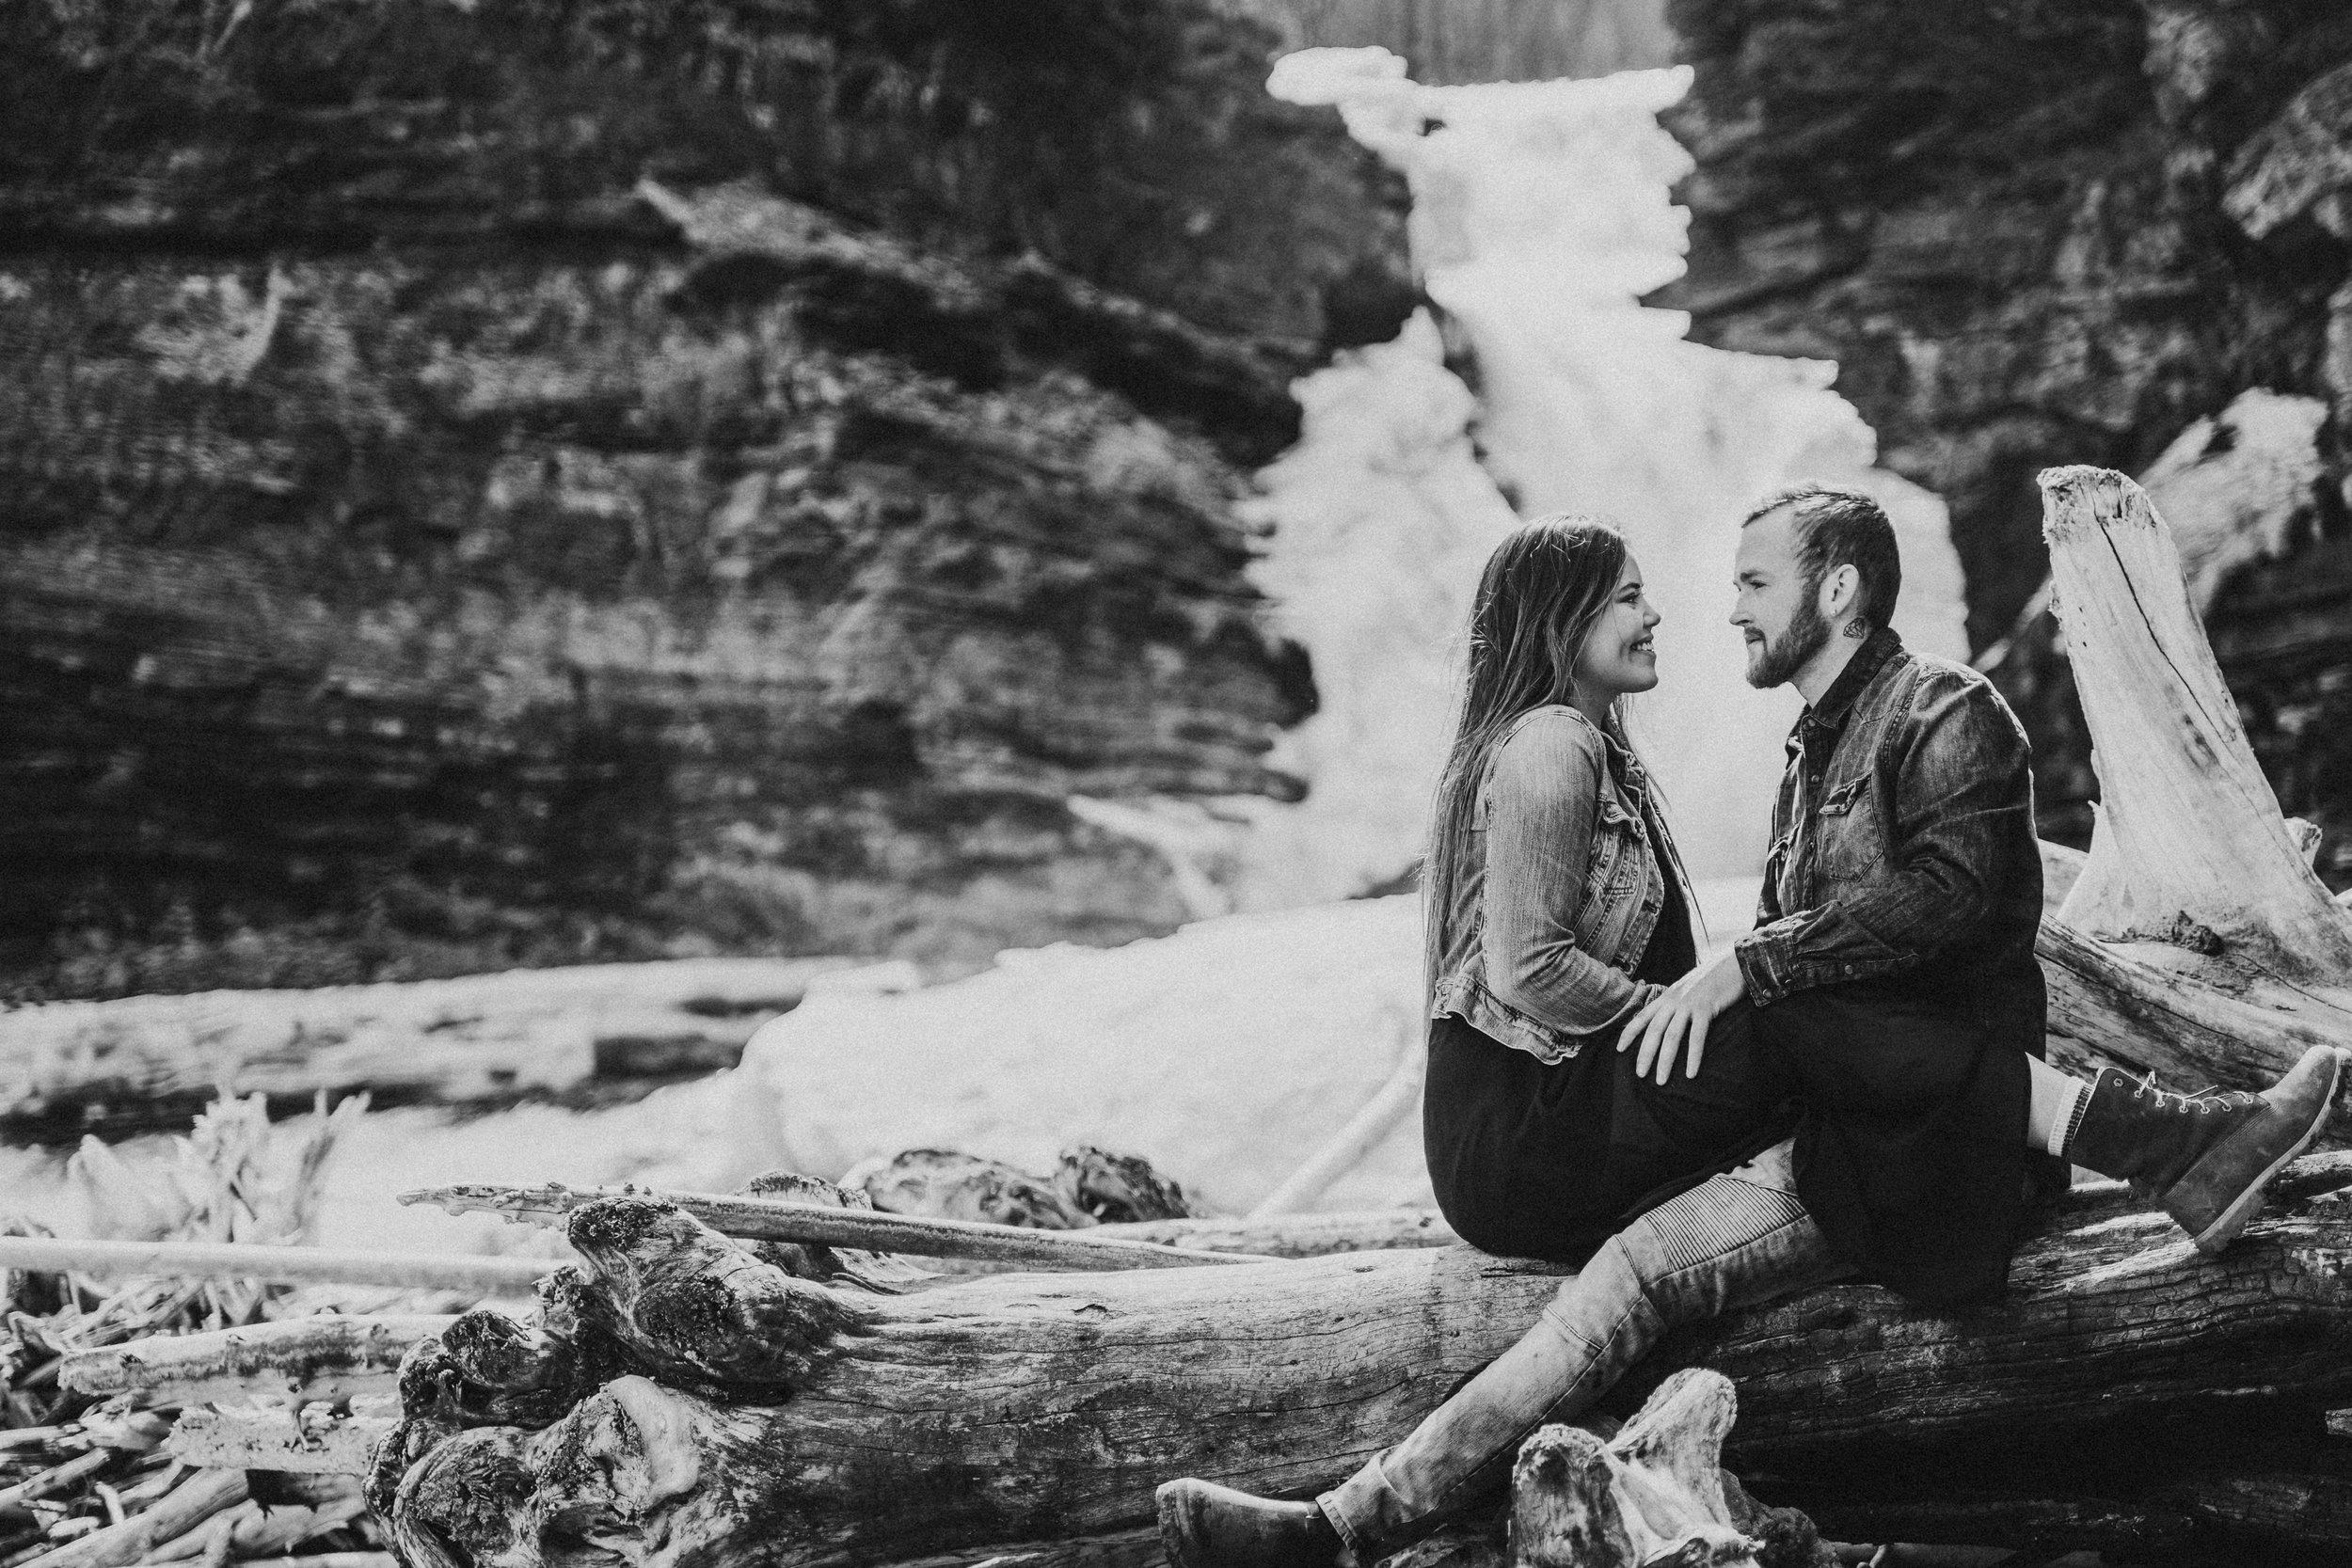 tyraephotography_photographer_wedding_elopement_engagement_photography-04409.jpg